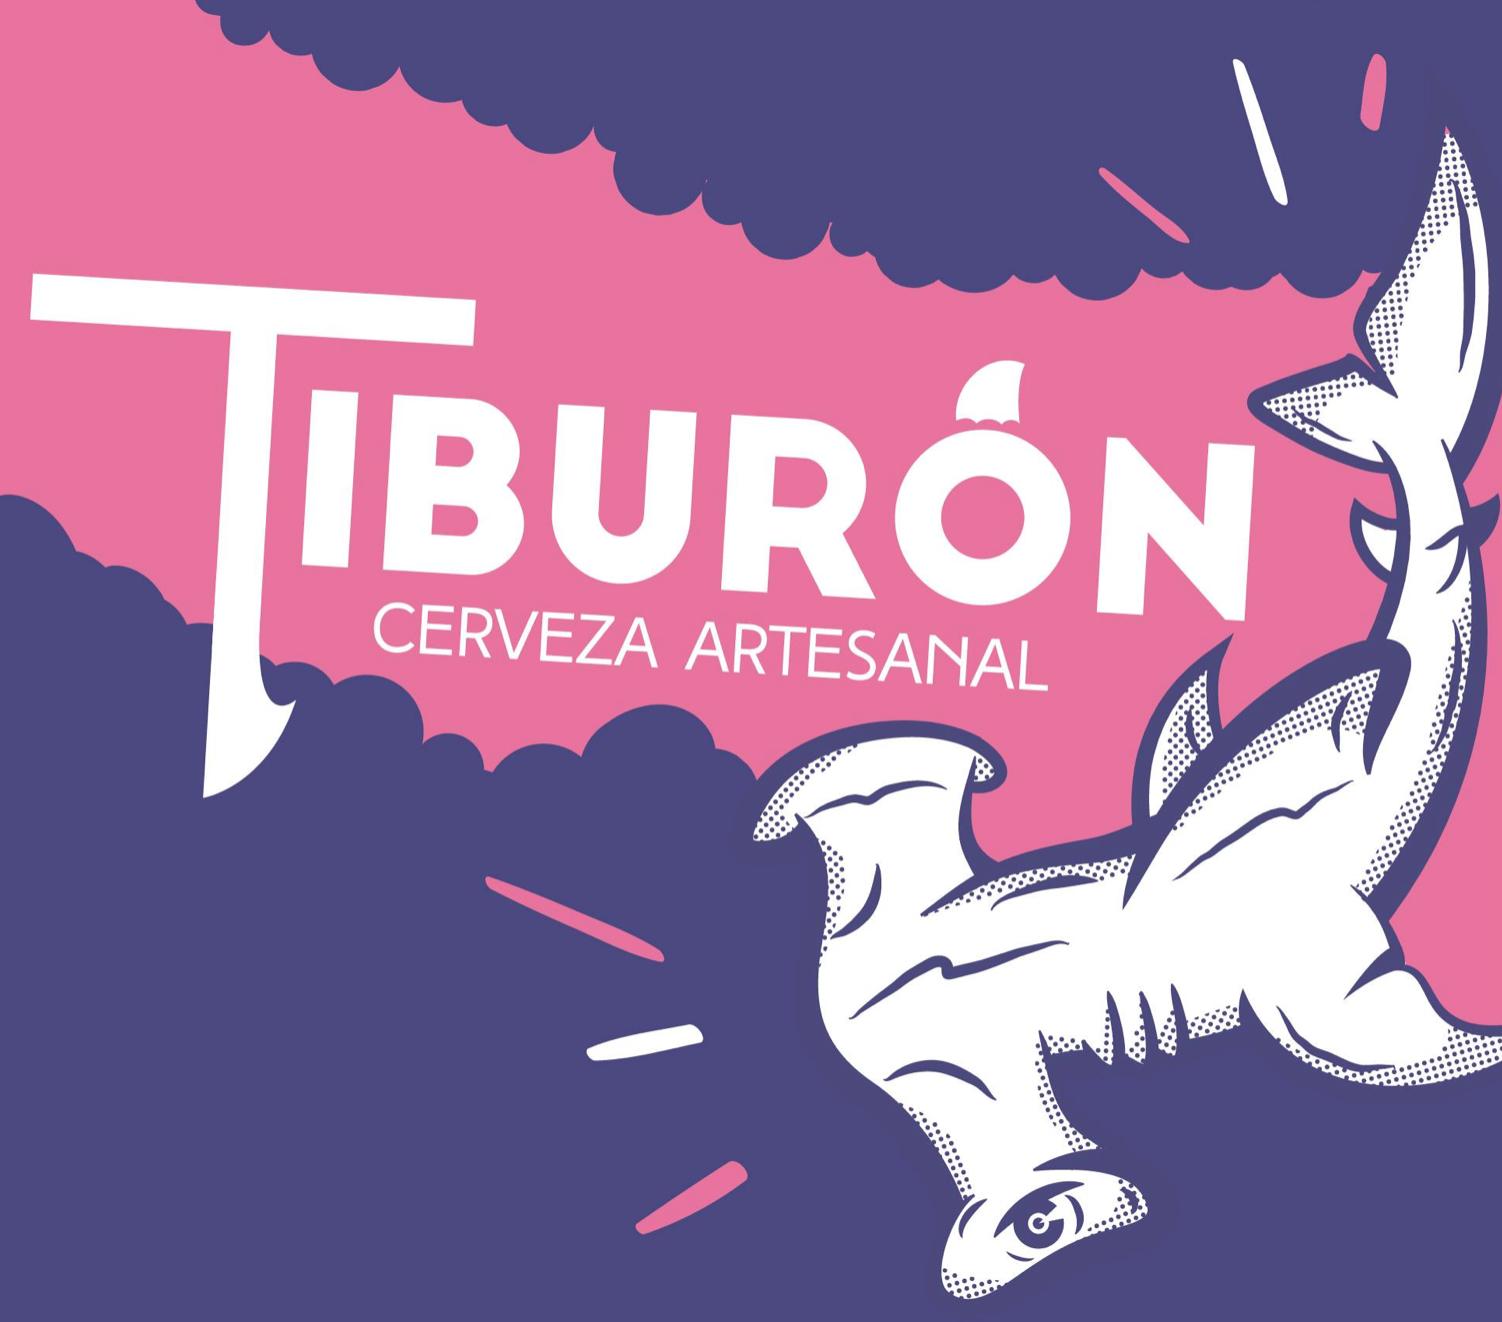 CERVEZA ARTESANAL TIBURÓN   @facebook   @instagram